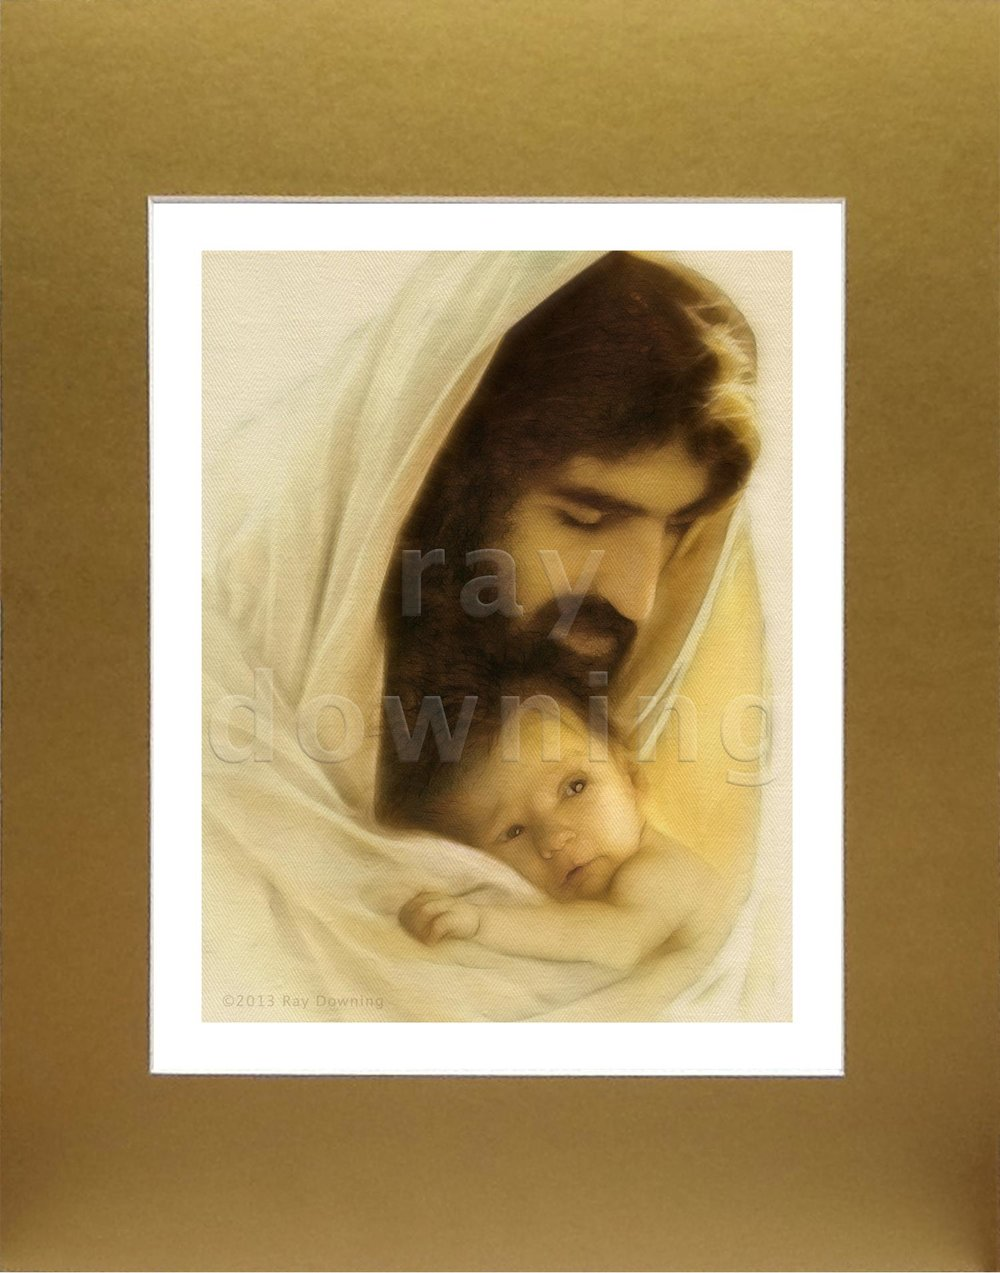 jesus-pictures-shroud-of-turin-children.jpg